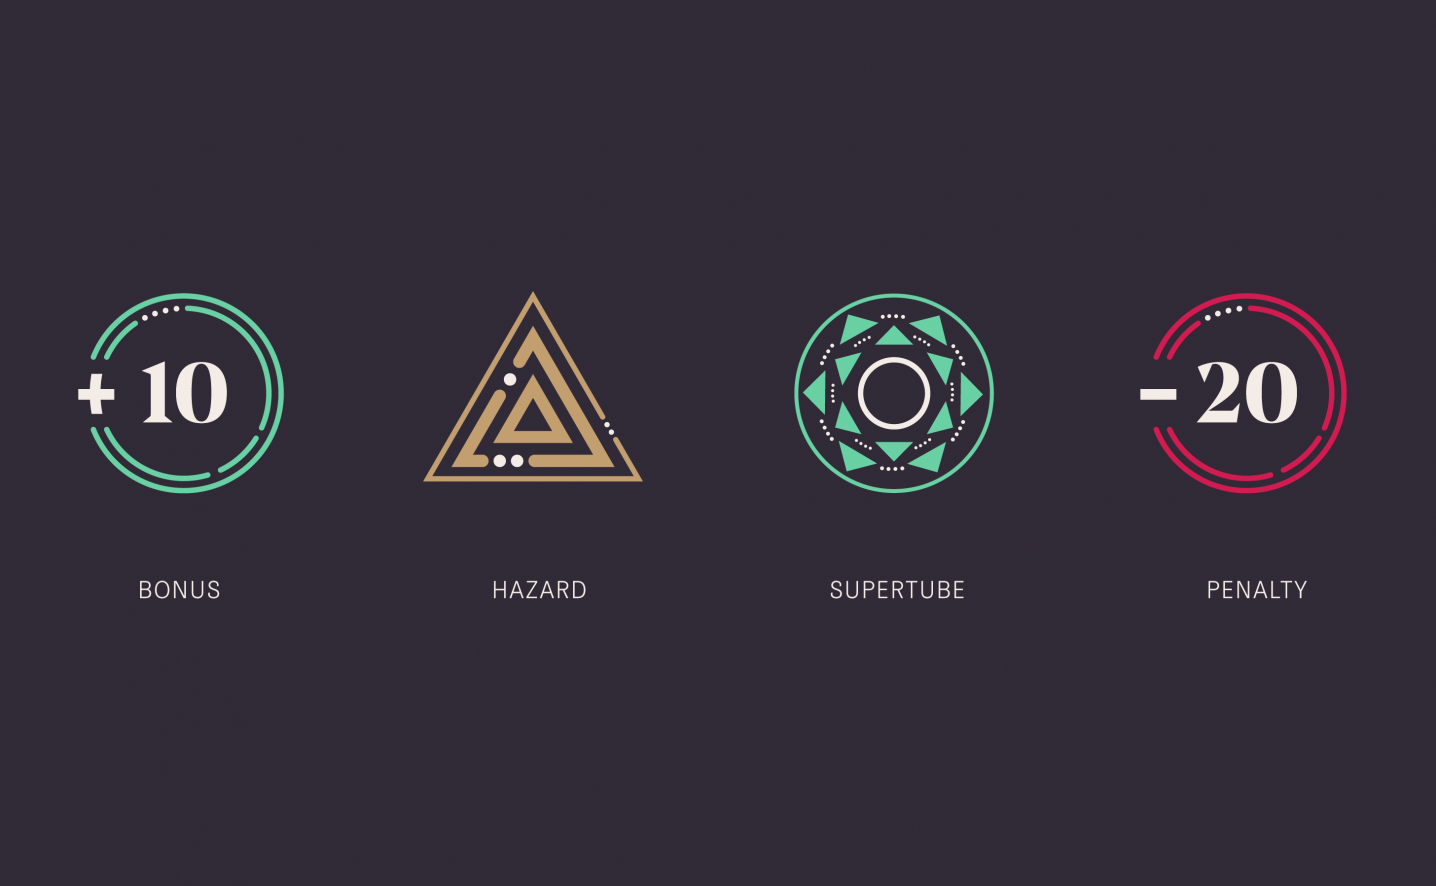 Puttshack-gameplay-elements-iconography